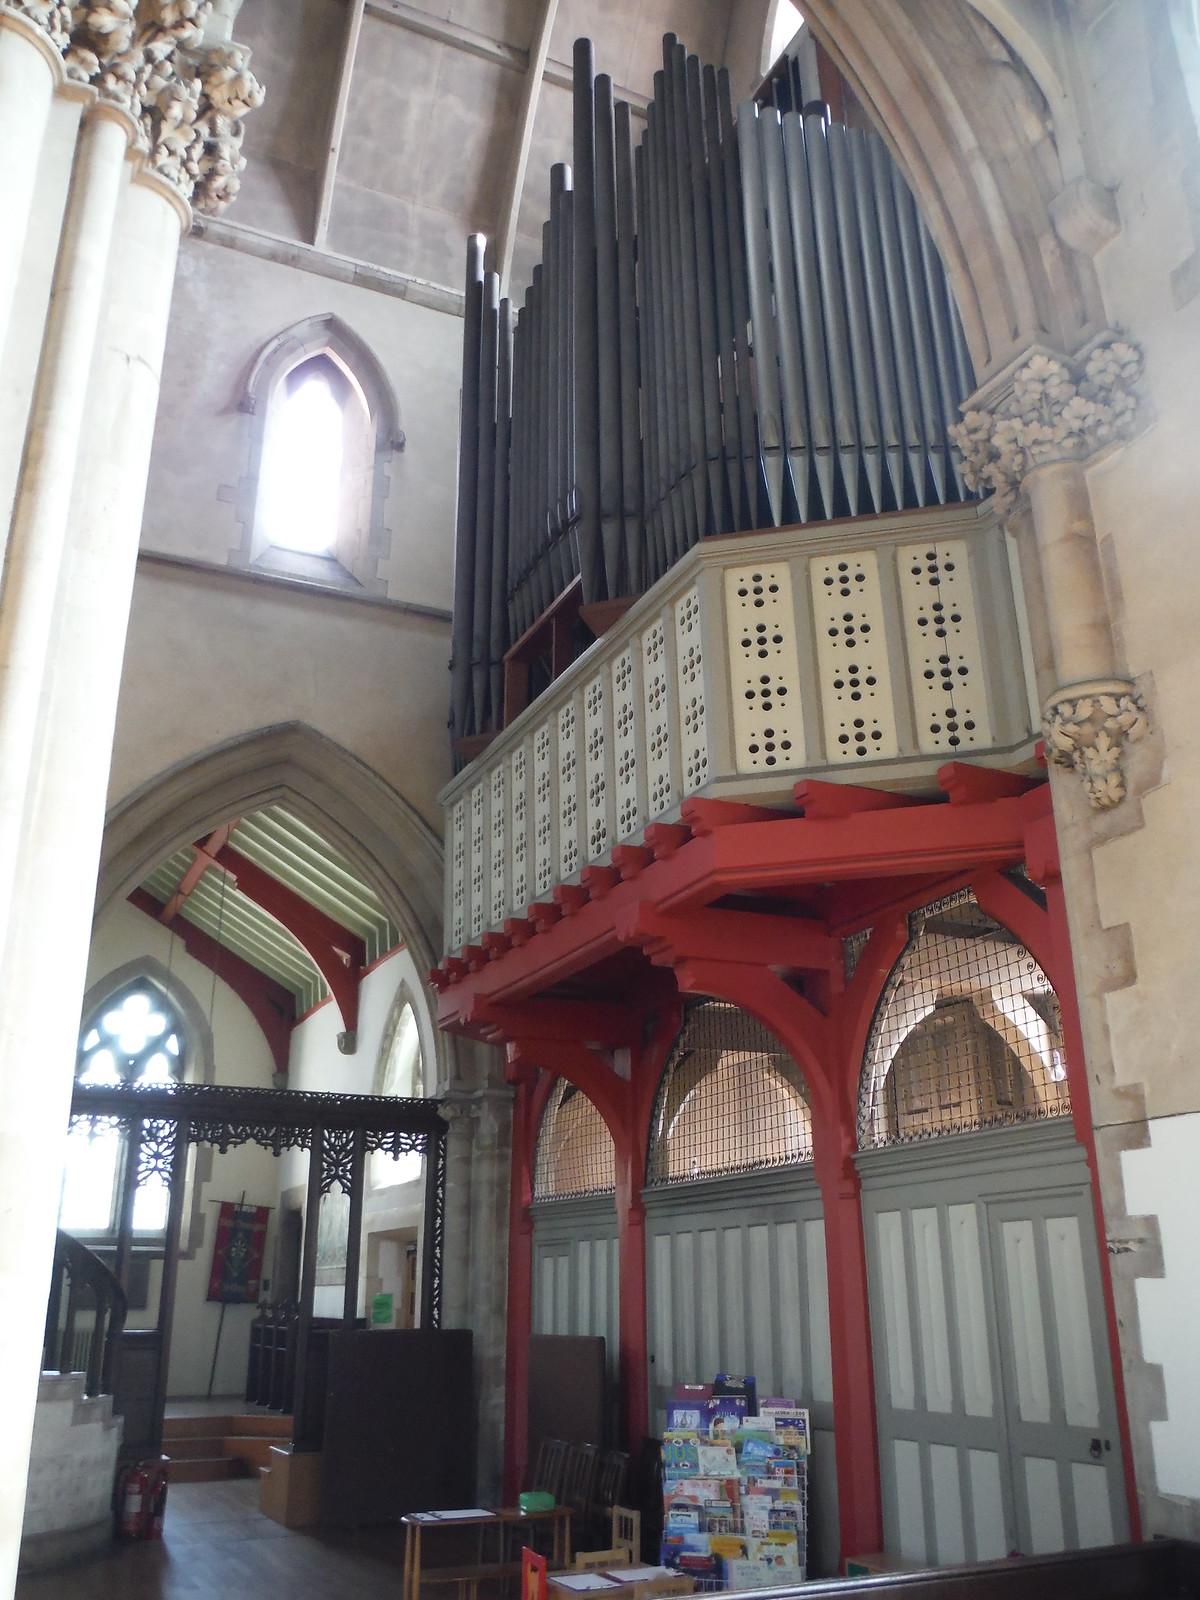 St. Mary's, Stoke Newington (Organ) SWC Short Walk 26 - Woodberry Wetlands (Stoke Newington Reservoirs)